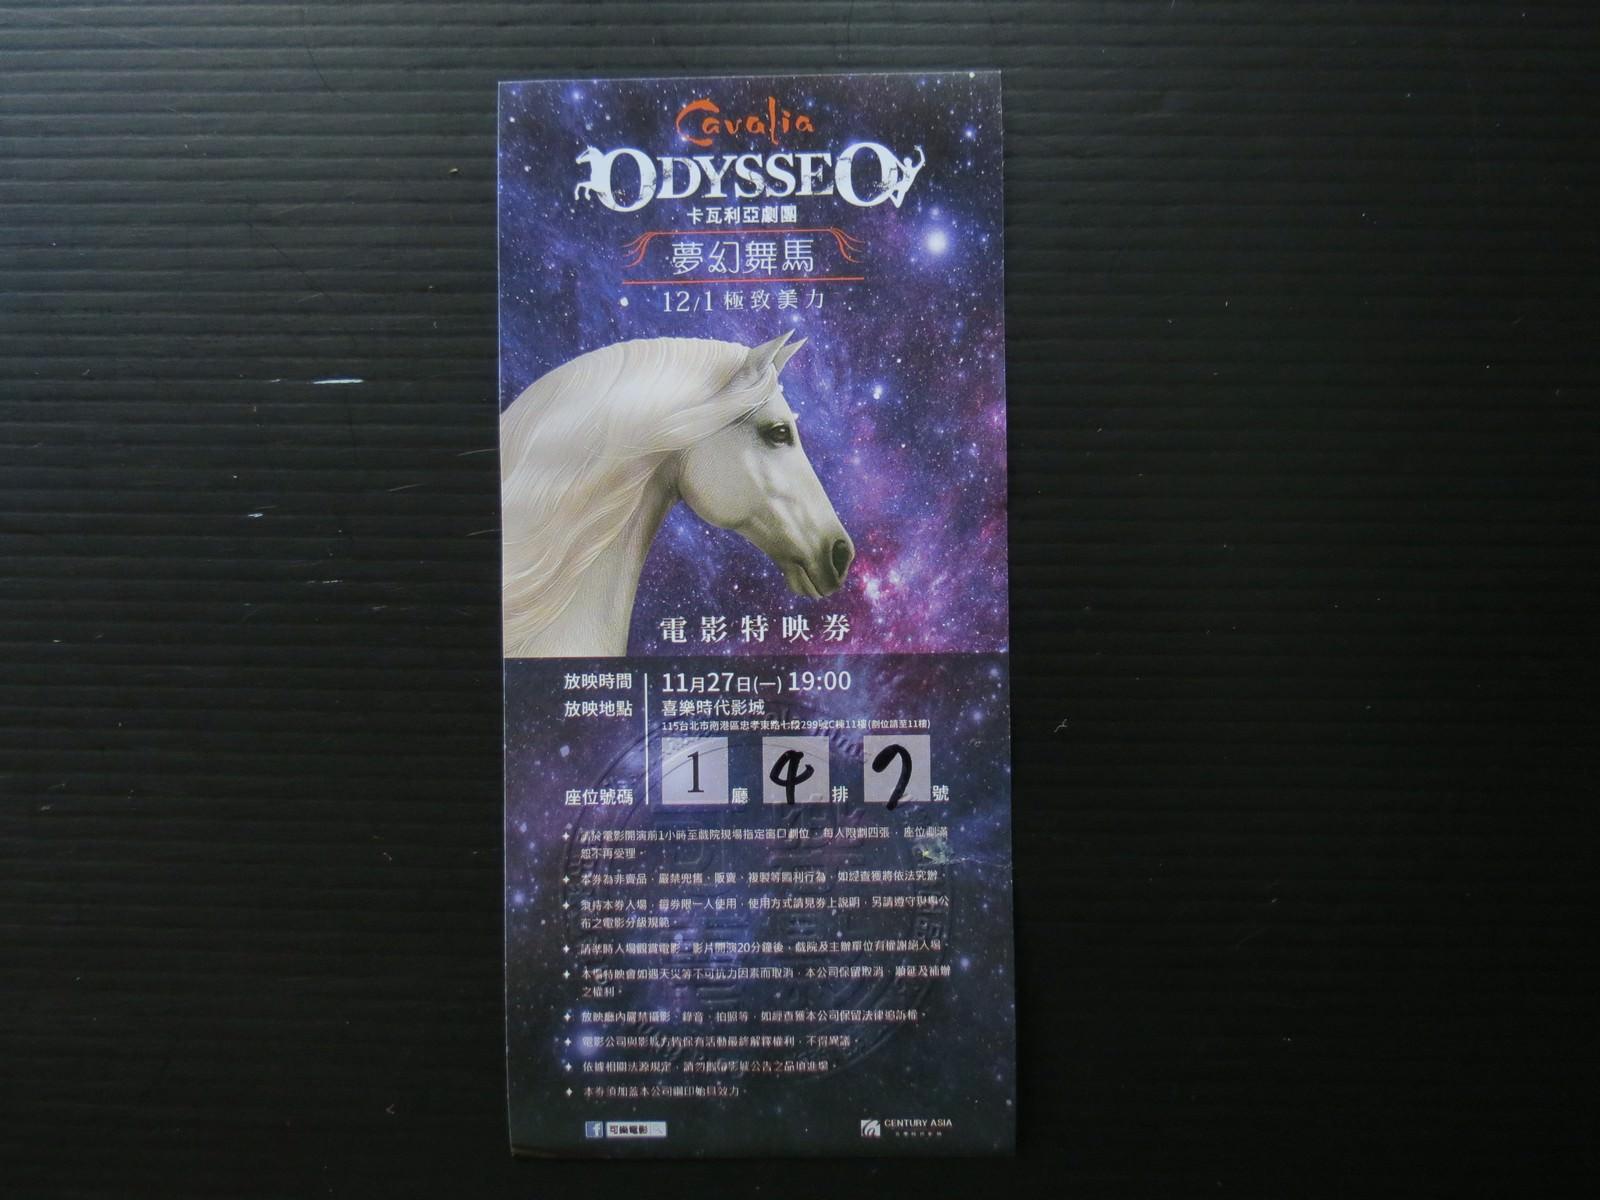 Movie, Odysseo by Cavalia(韓國, 2015年) / 夢幻舞馬-卡瓦利亞(台灣), 特映會電影票